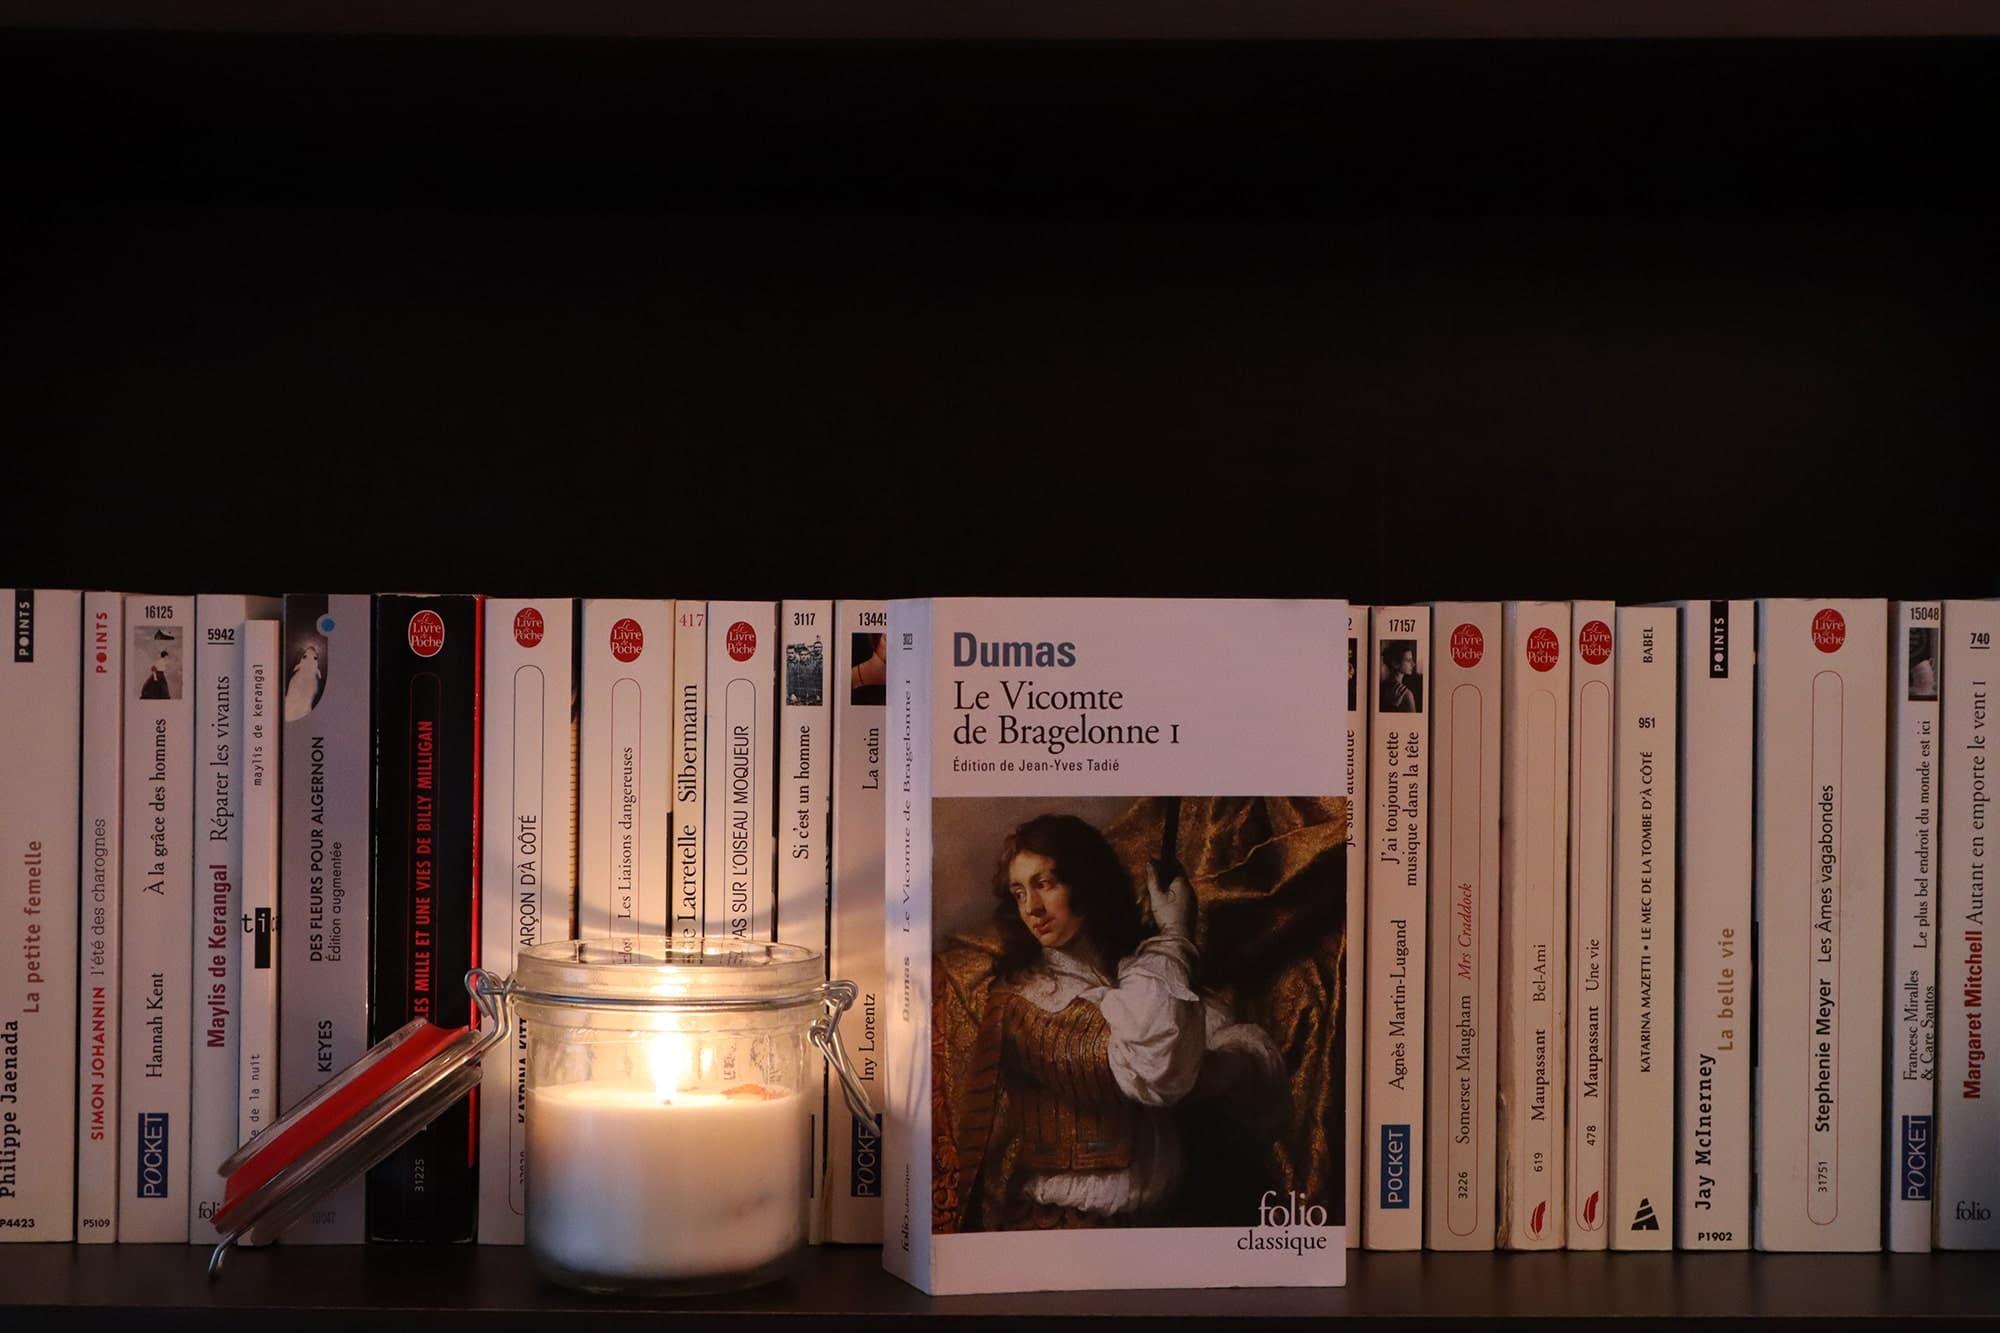 Le vicomte de Bragelonne I, Alexandre Dumas – 1997 – Ed. Folio, 912 p.